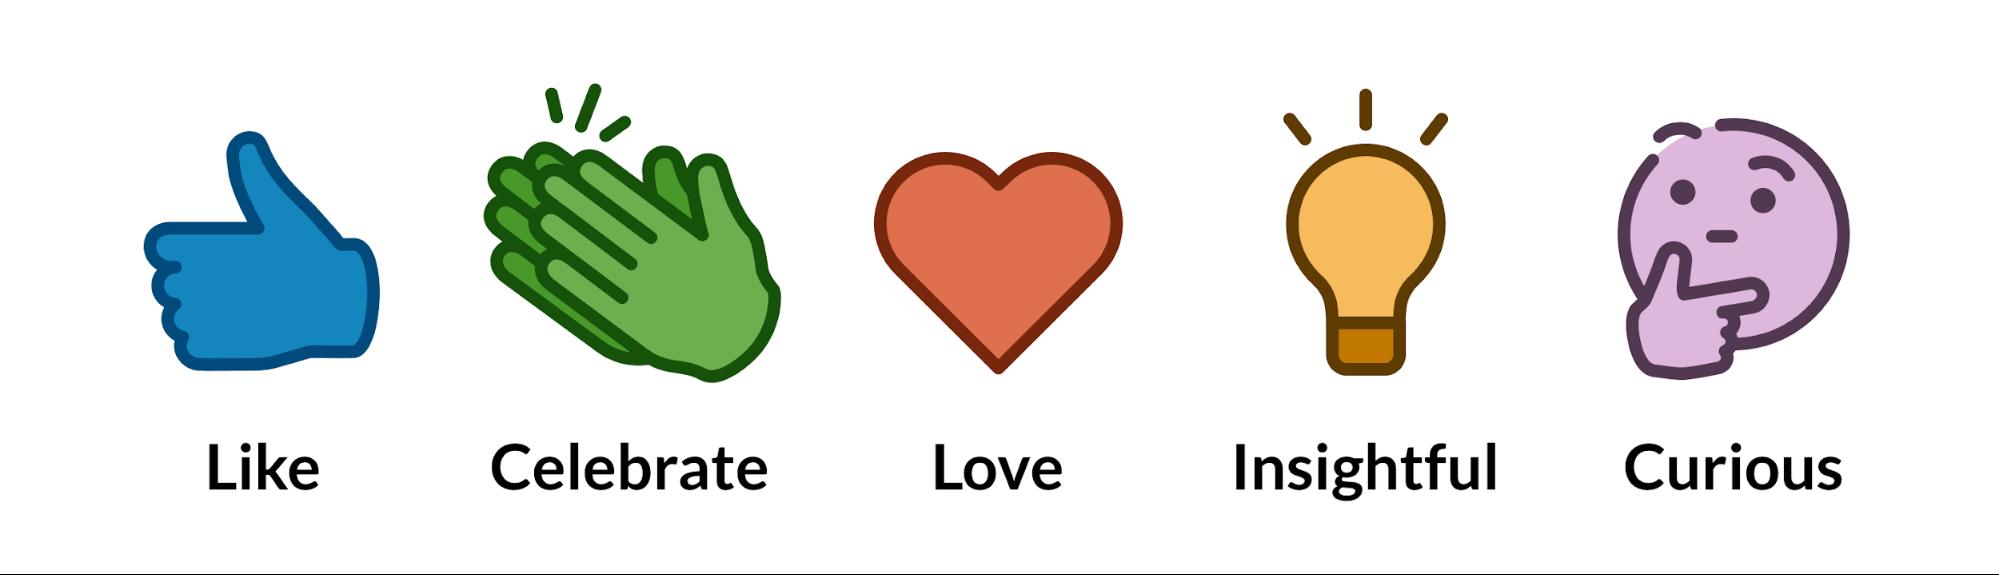 emojis likes sondage linkedin